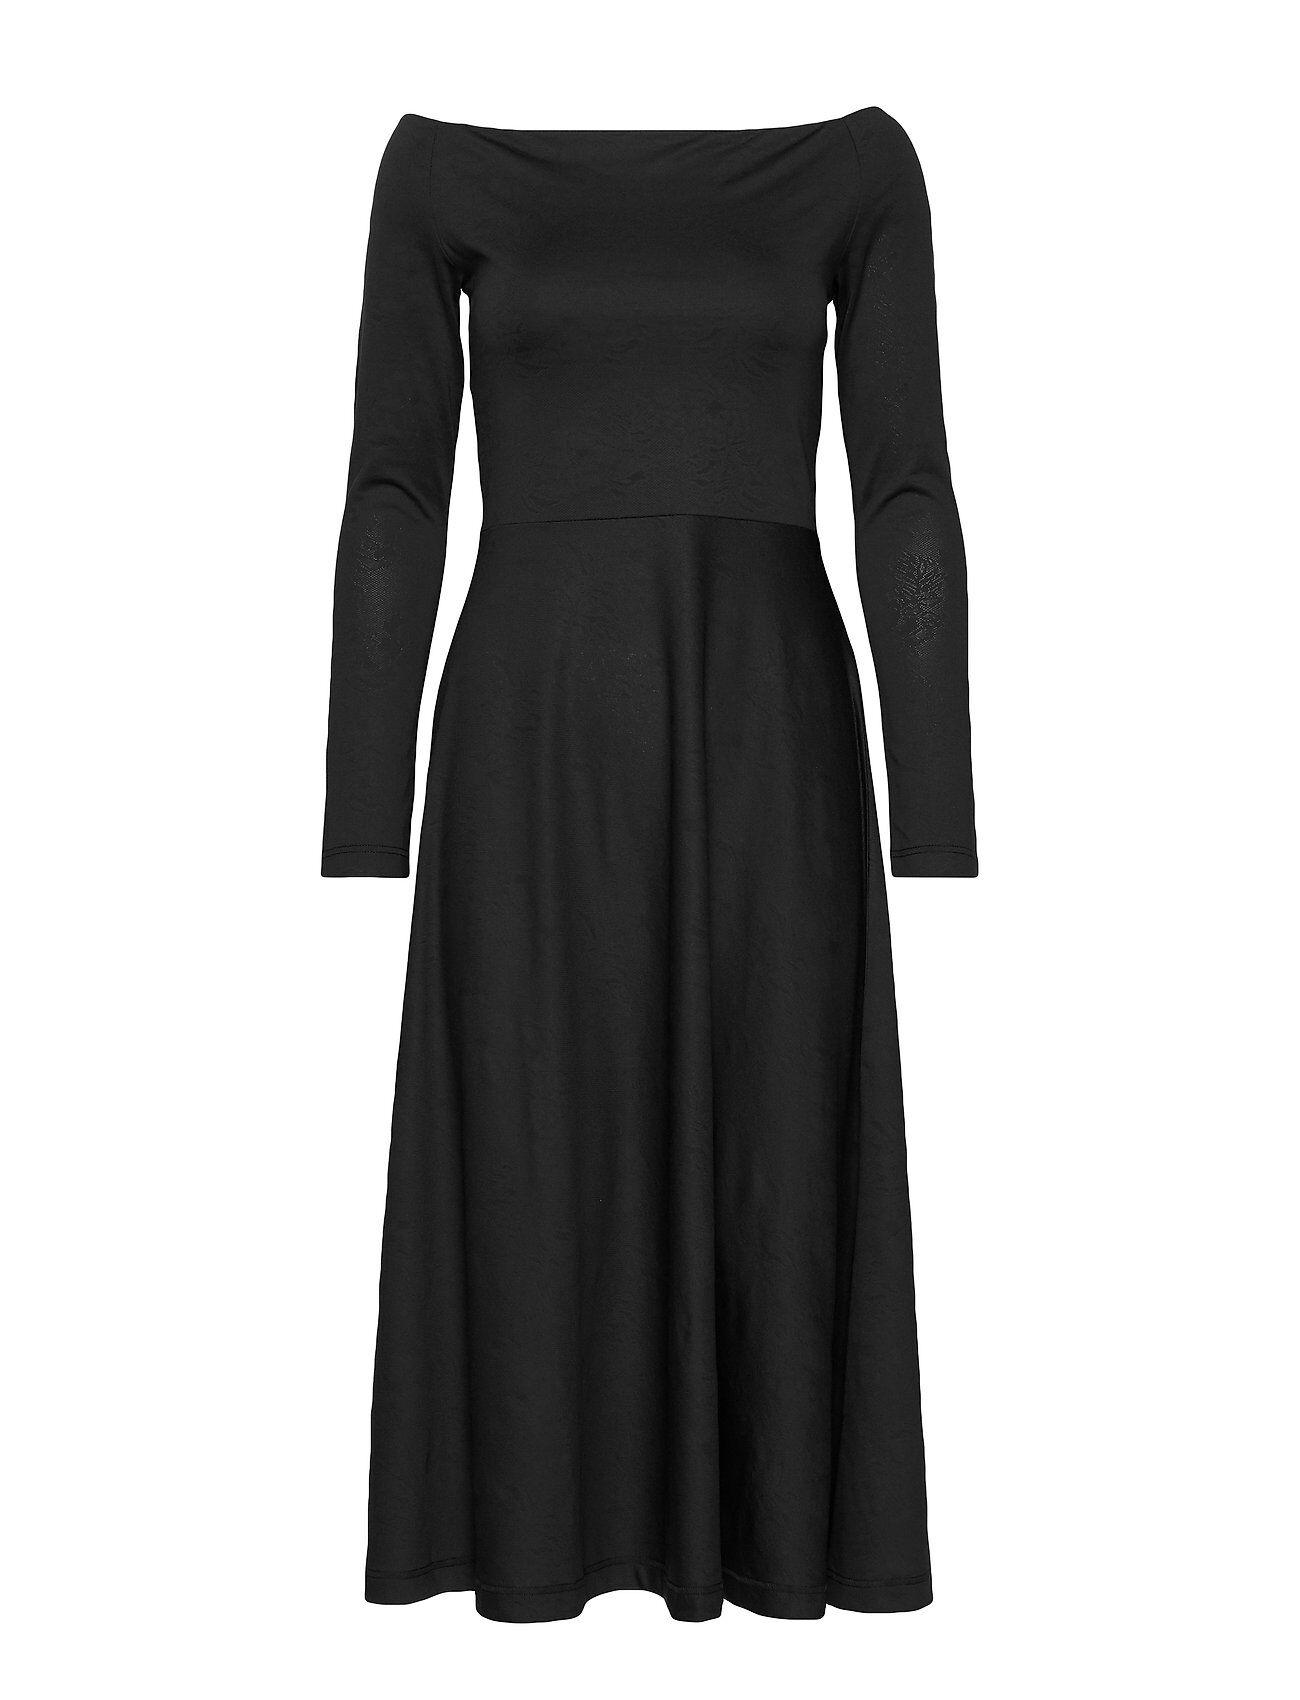 Residus Benedicte Jacq. Dress Polvipituinen Mekko Musta Residus